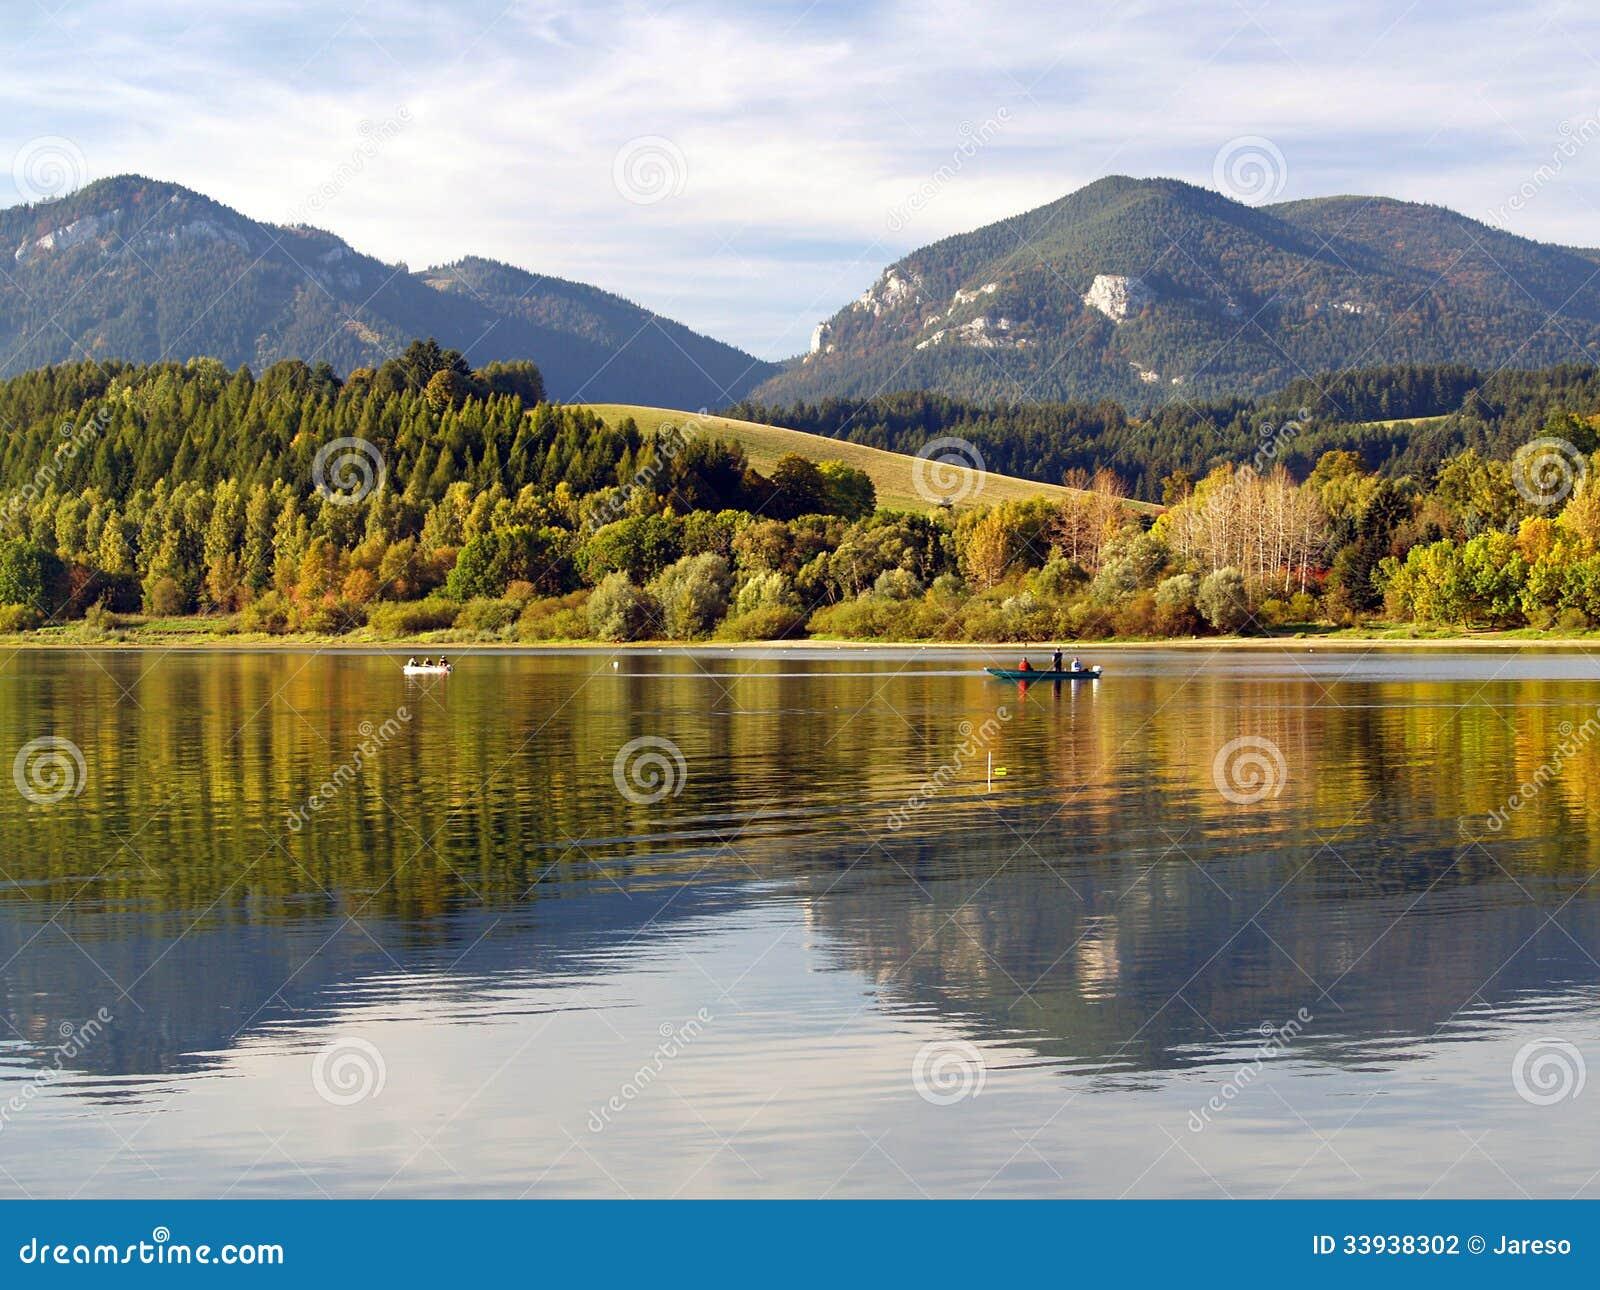 Reflection of Pravnac and Lomy hills, Slovakia